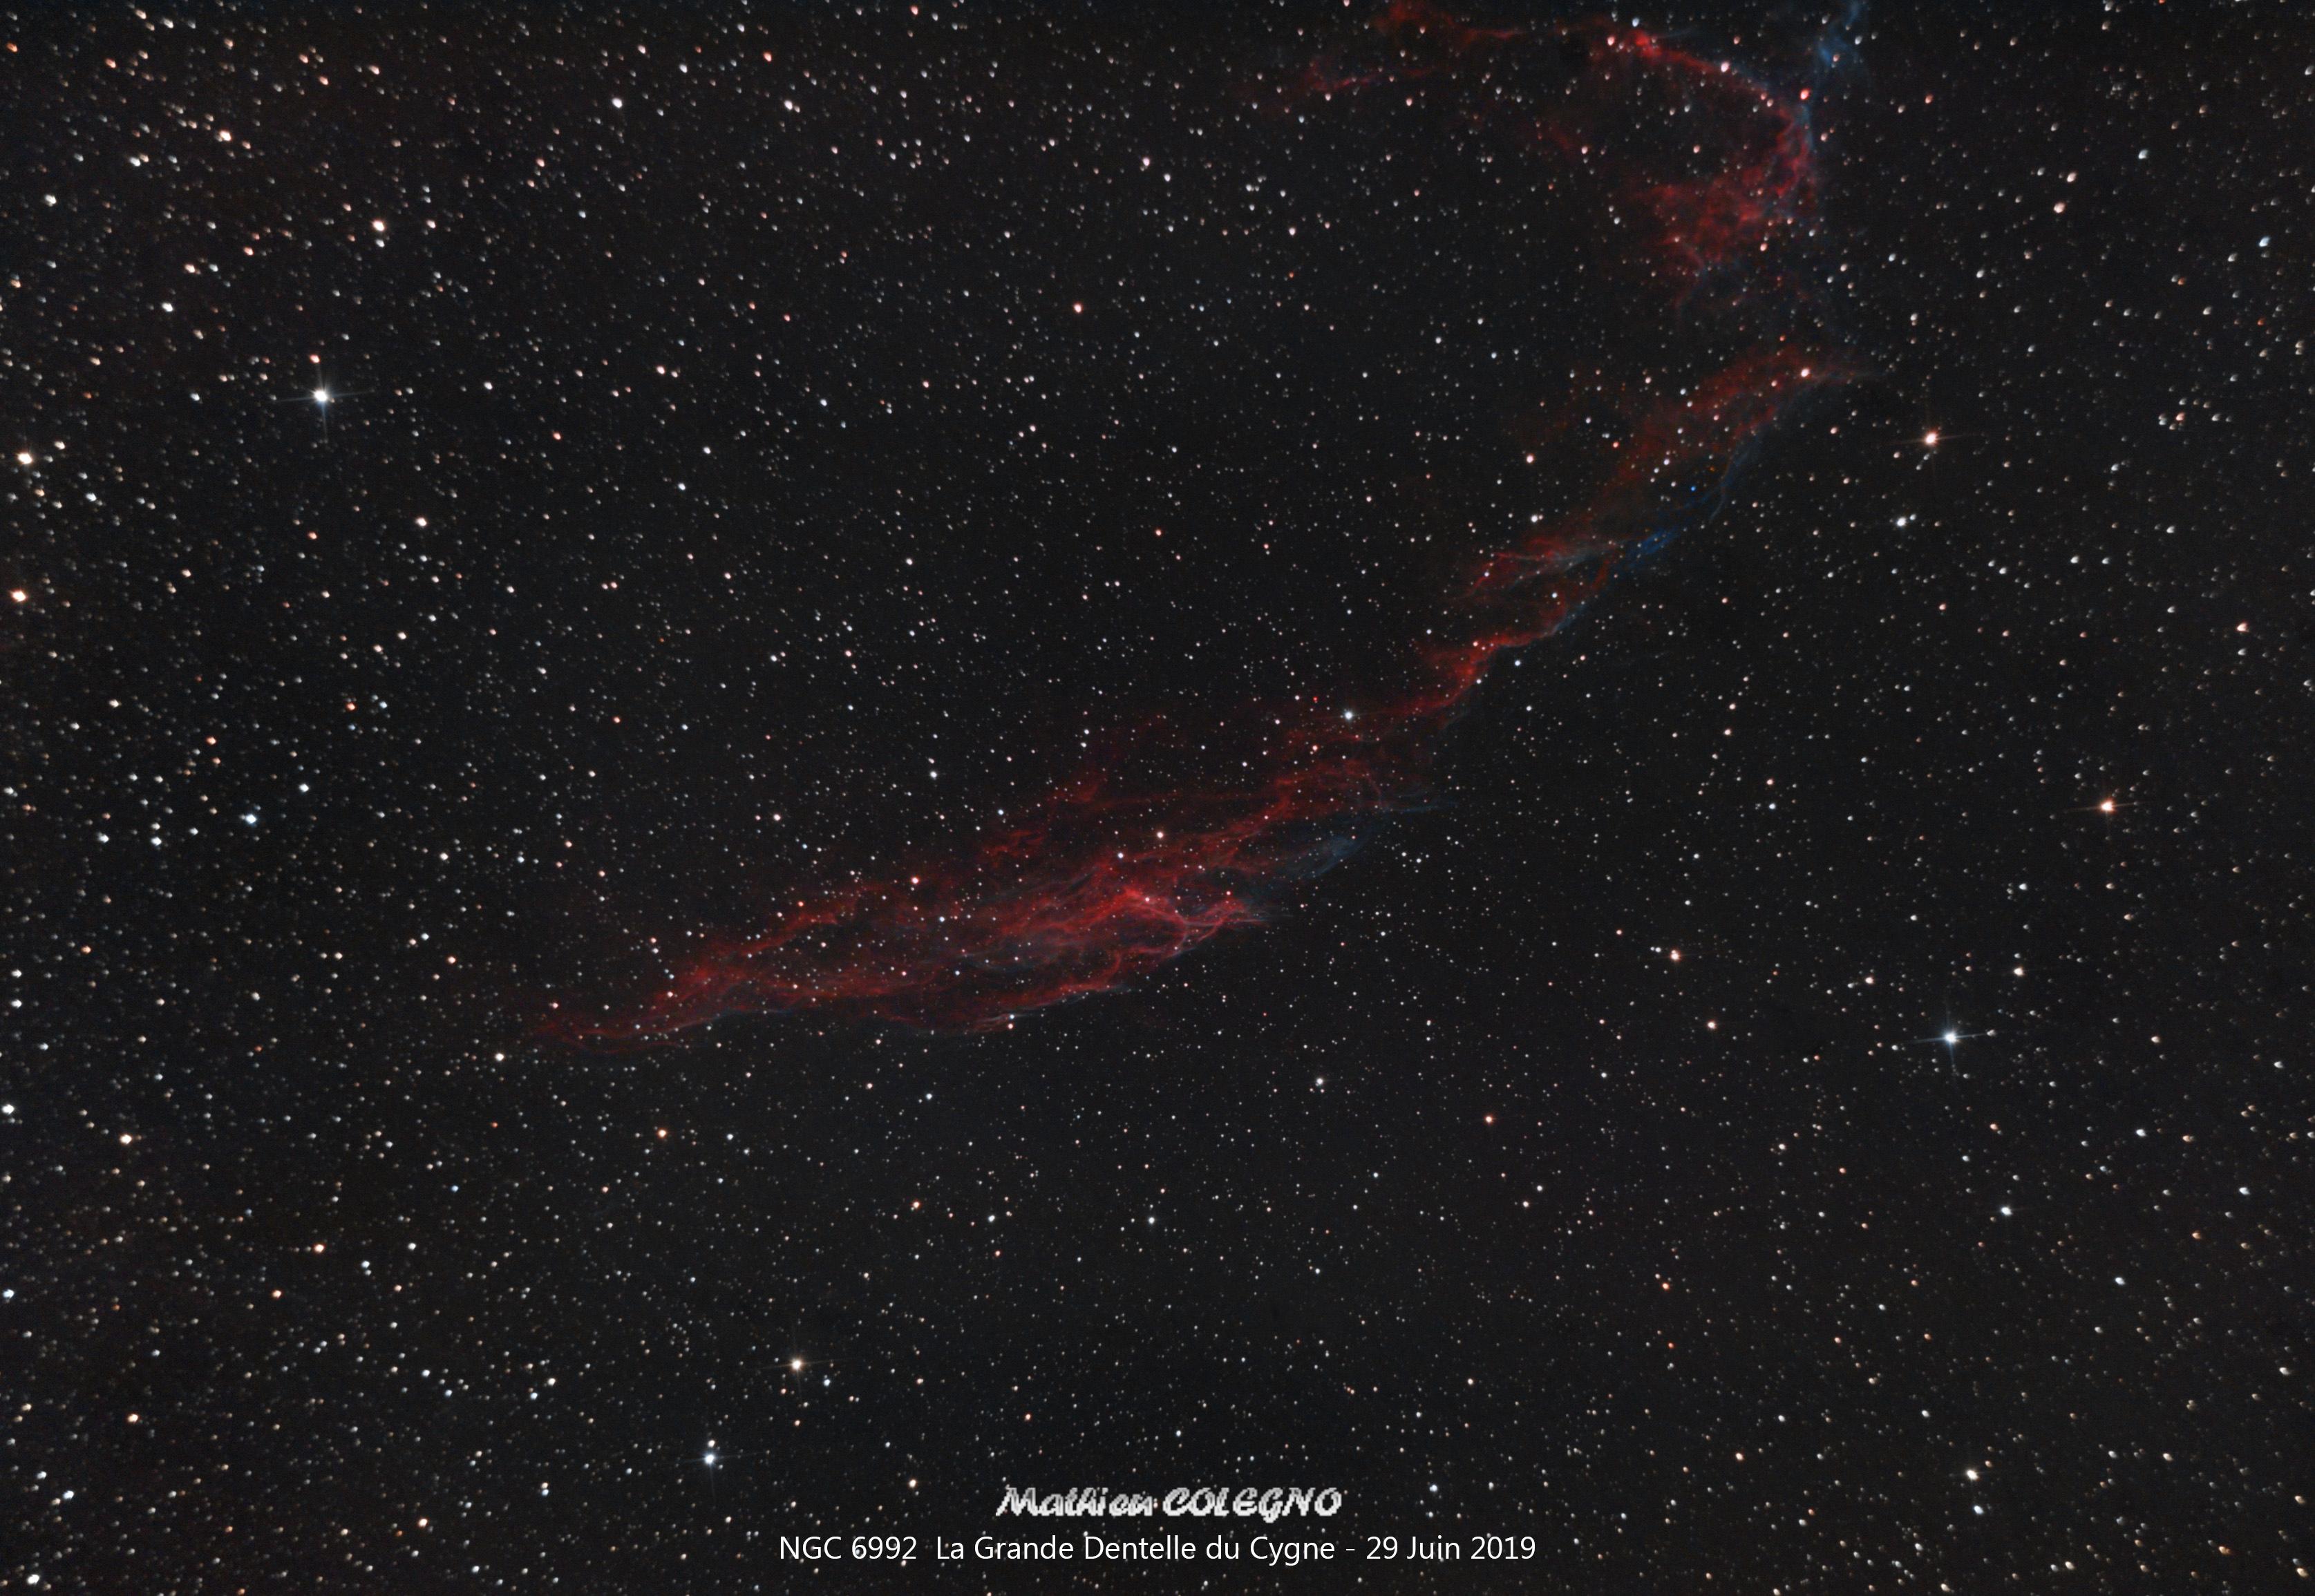 NGC6992 - La Grande Dentelle du Cygne